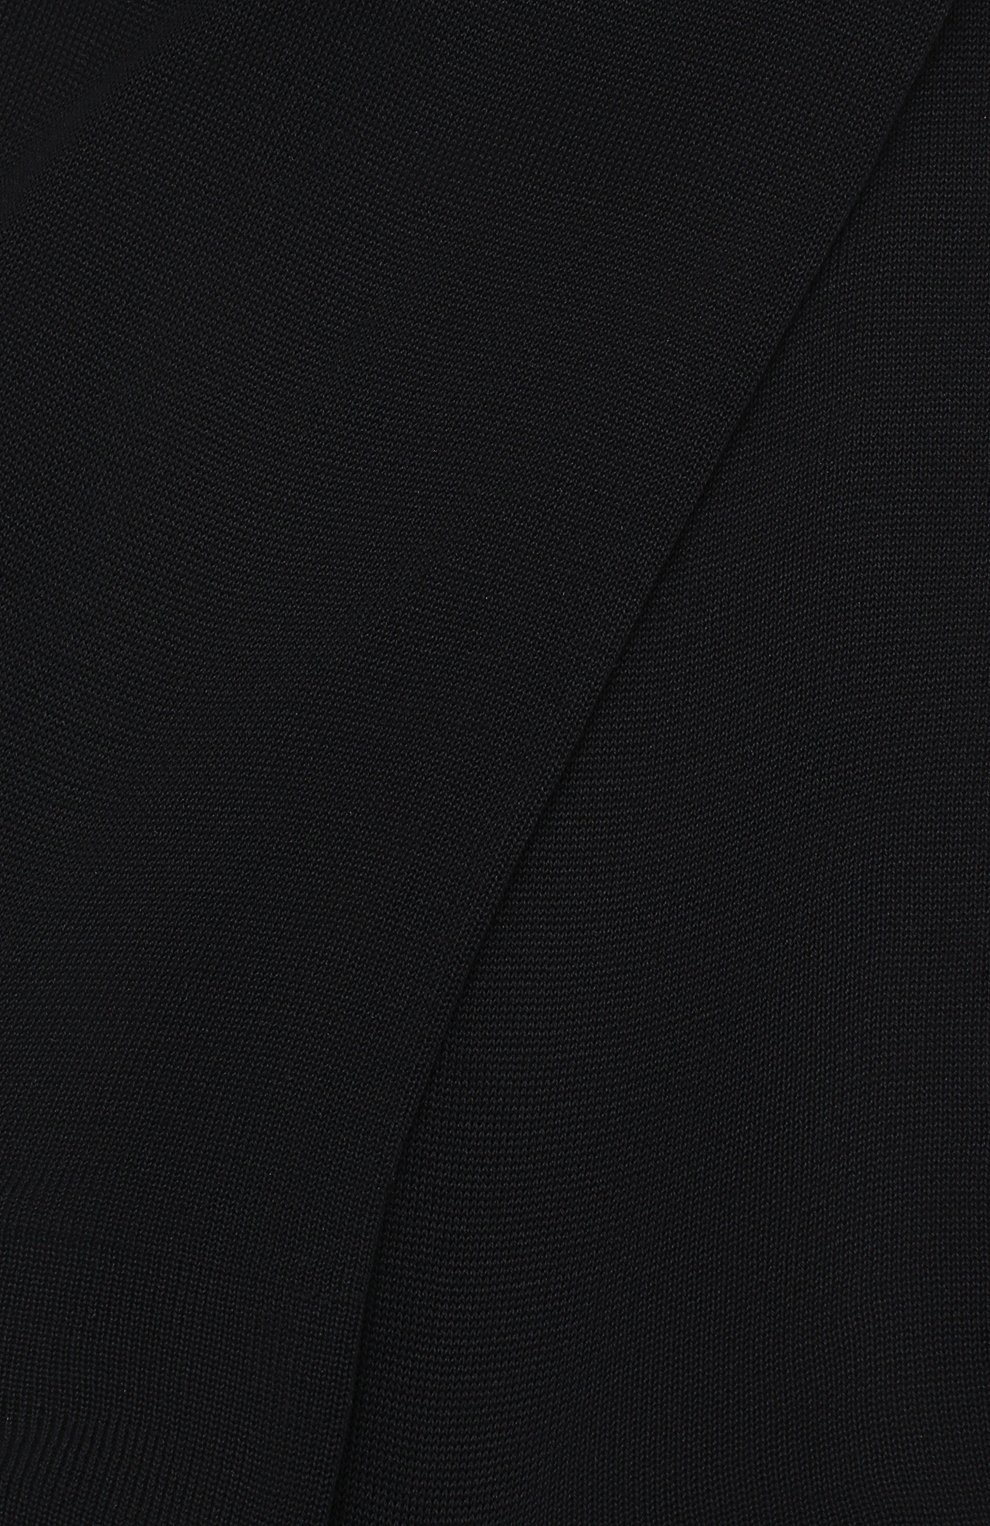 Мужские хлопковые носки ERMENEGILDO ZEGNA темно-синего цвета, арт. N4V400020 | Фото 2